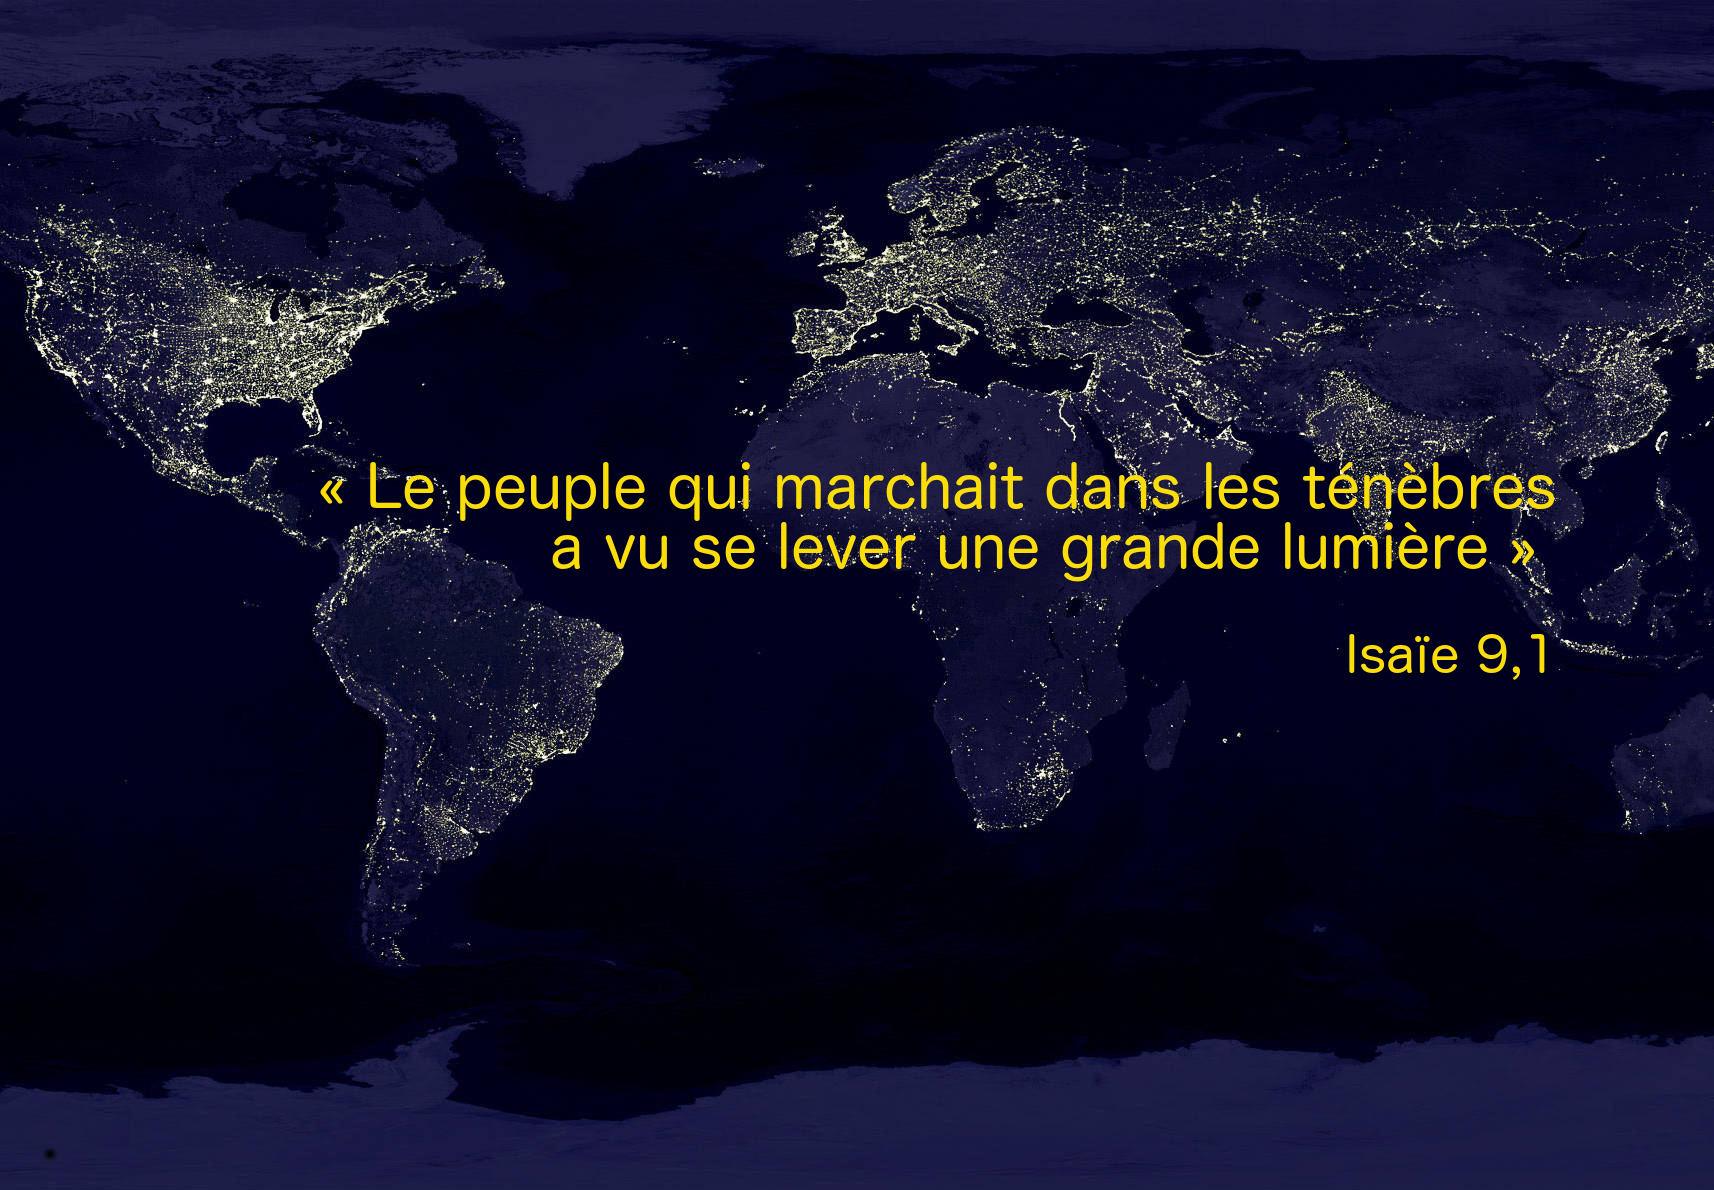 Terre-lumieres-nuit-1714x1200-2